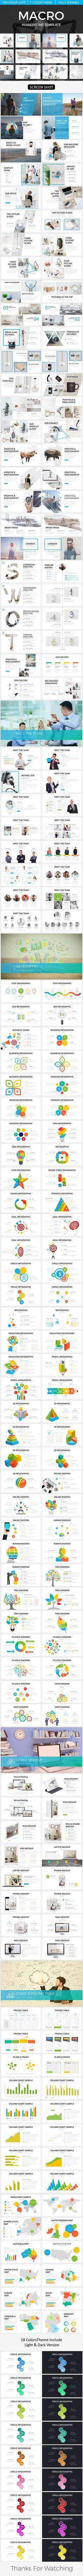 Macro PowerPoint Templates (PowerPoint Templates)